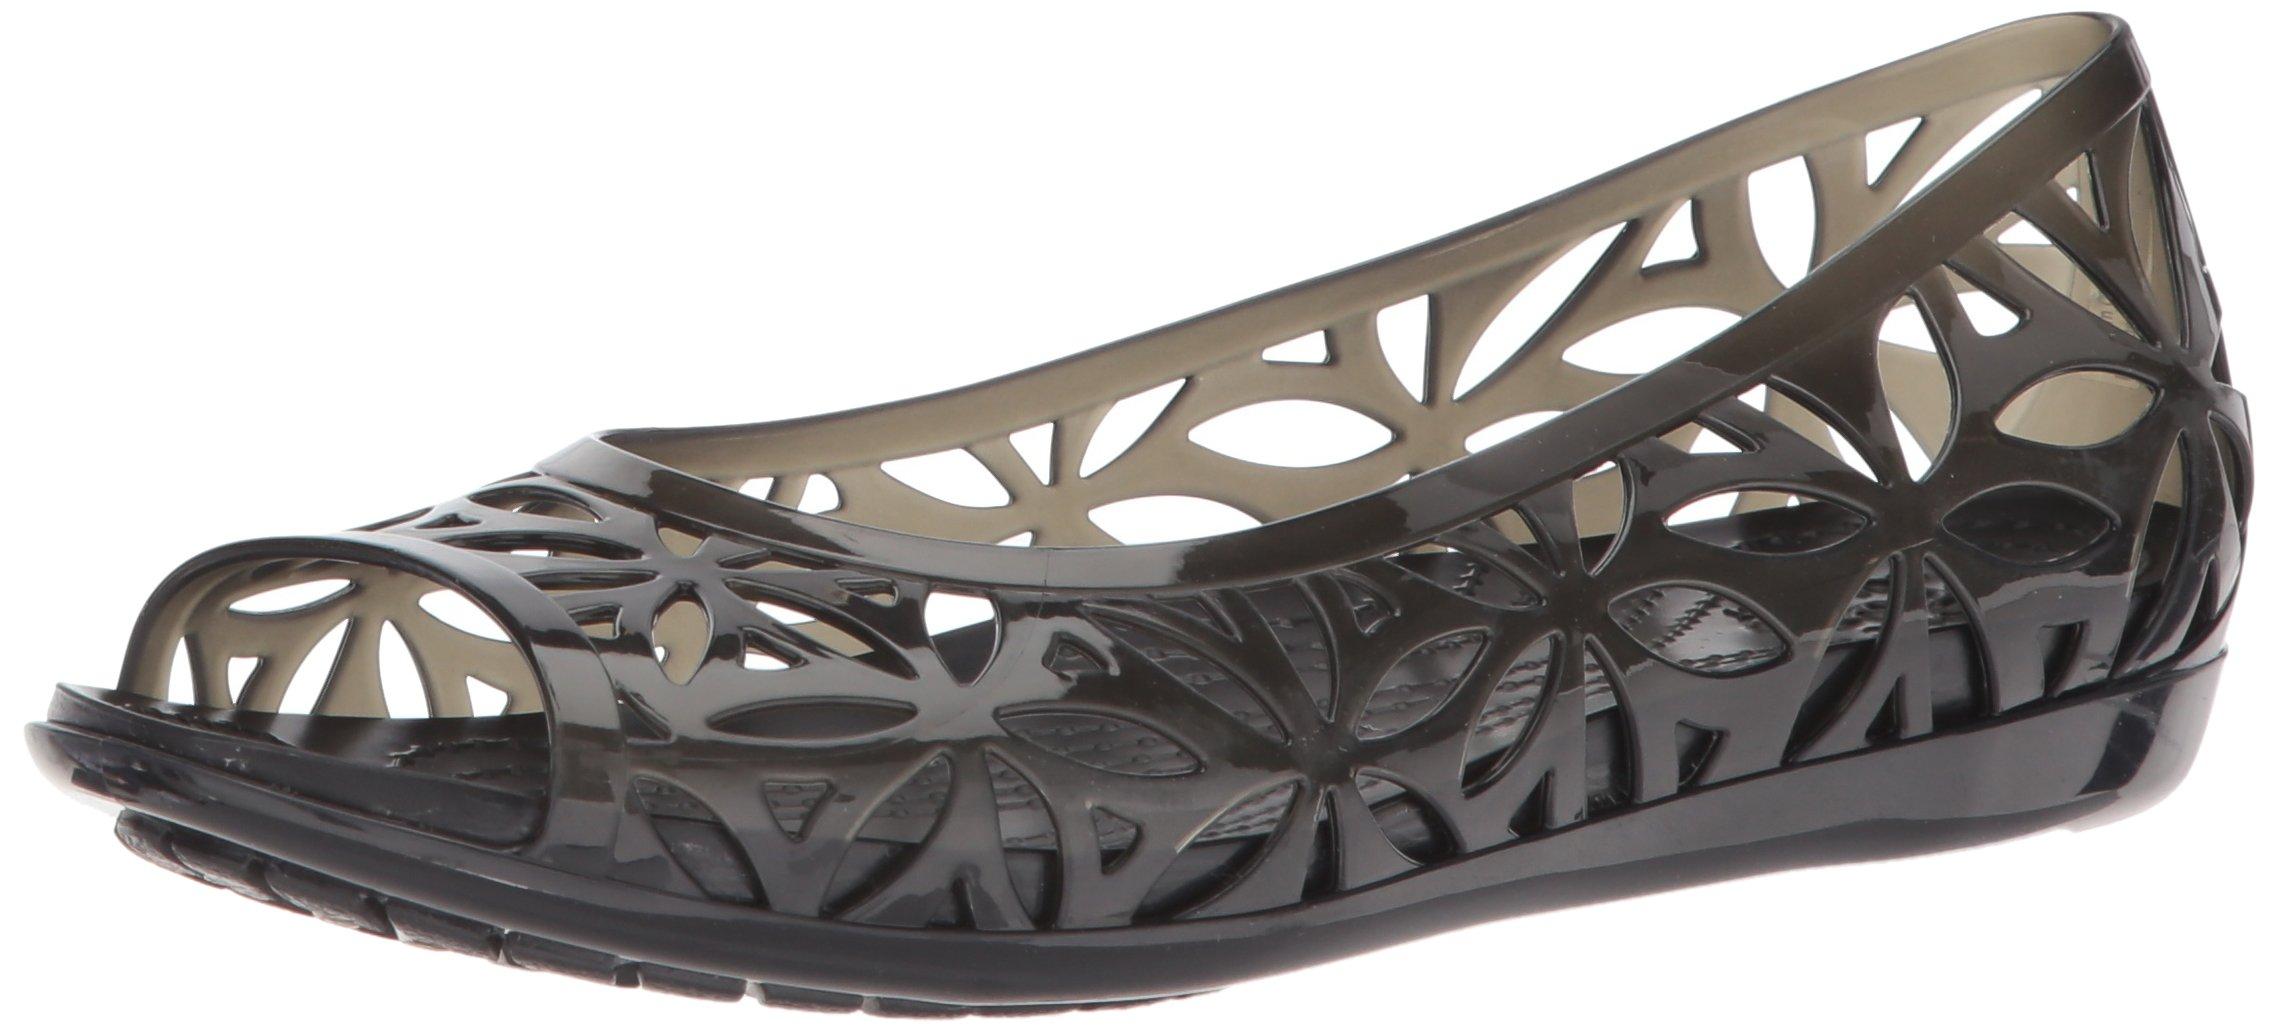 Crocs Women's Isabella Jelly II W Flat Sandal, Black/Black, 11 M US by Crocs